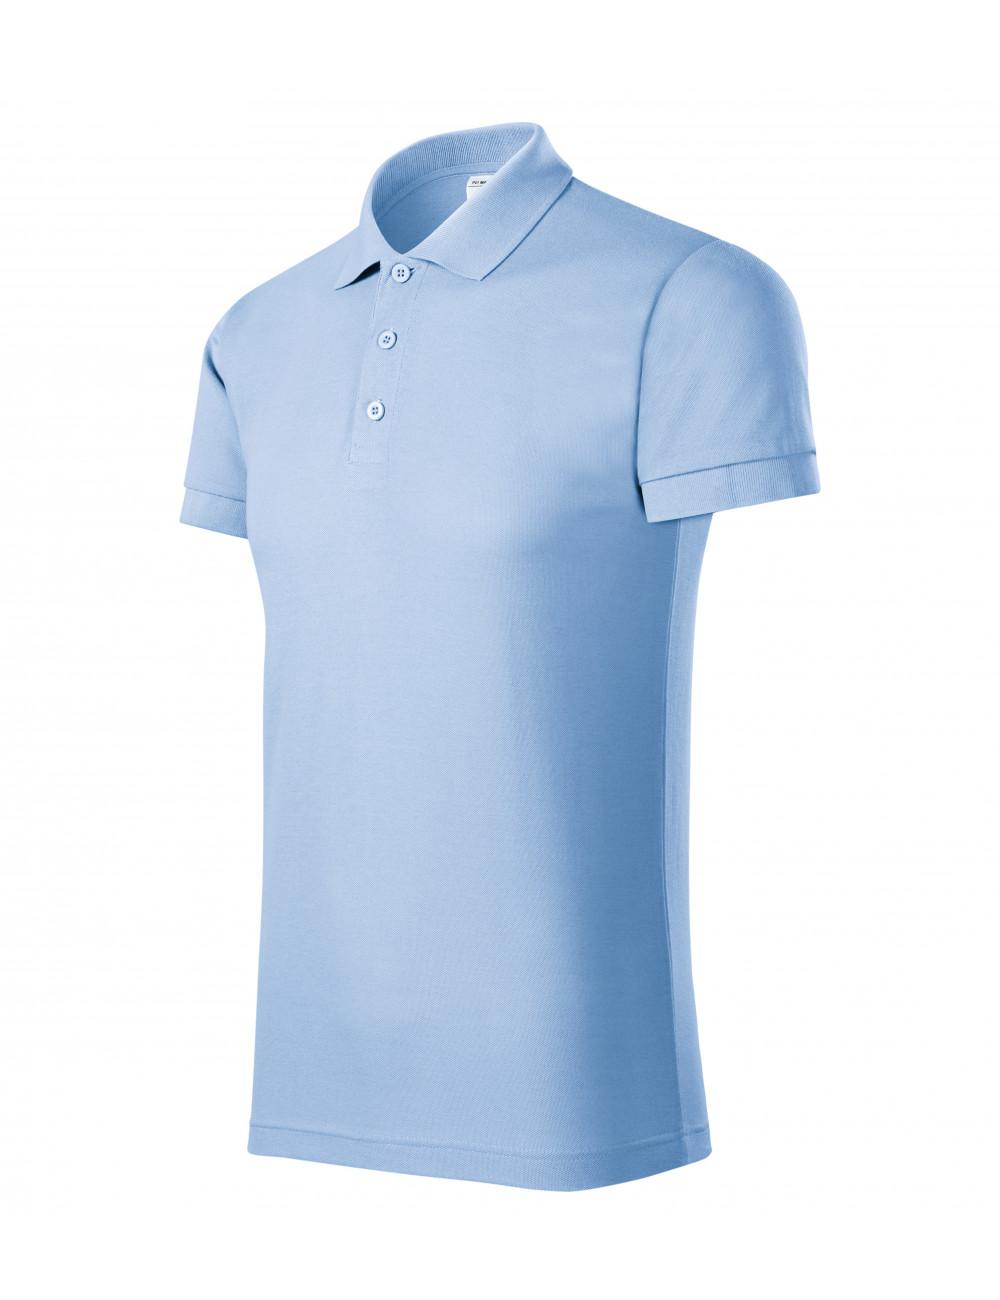 Adler PICCOLIO Koszulka polo męska Joy P21 błękitny